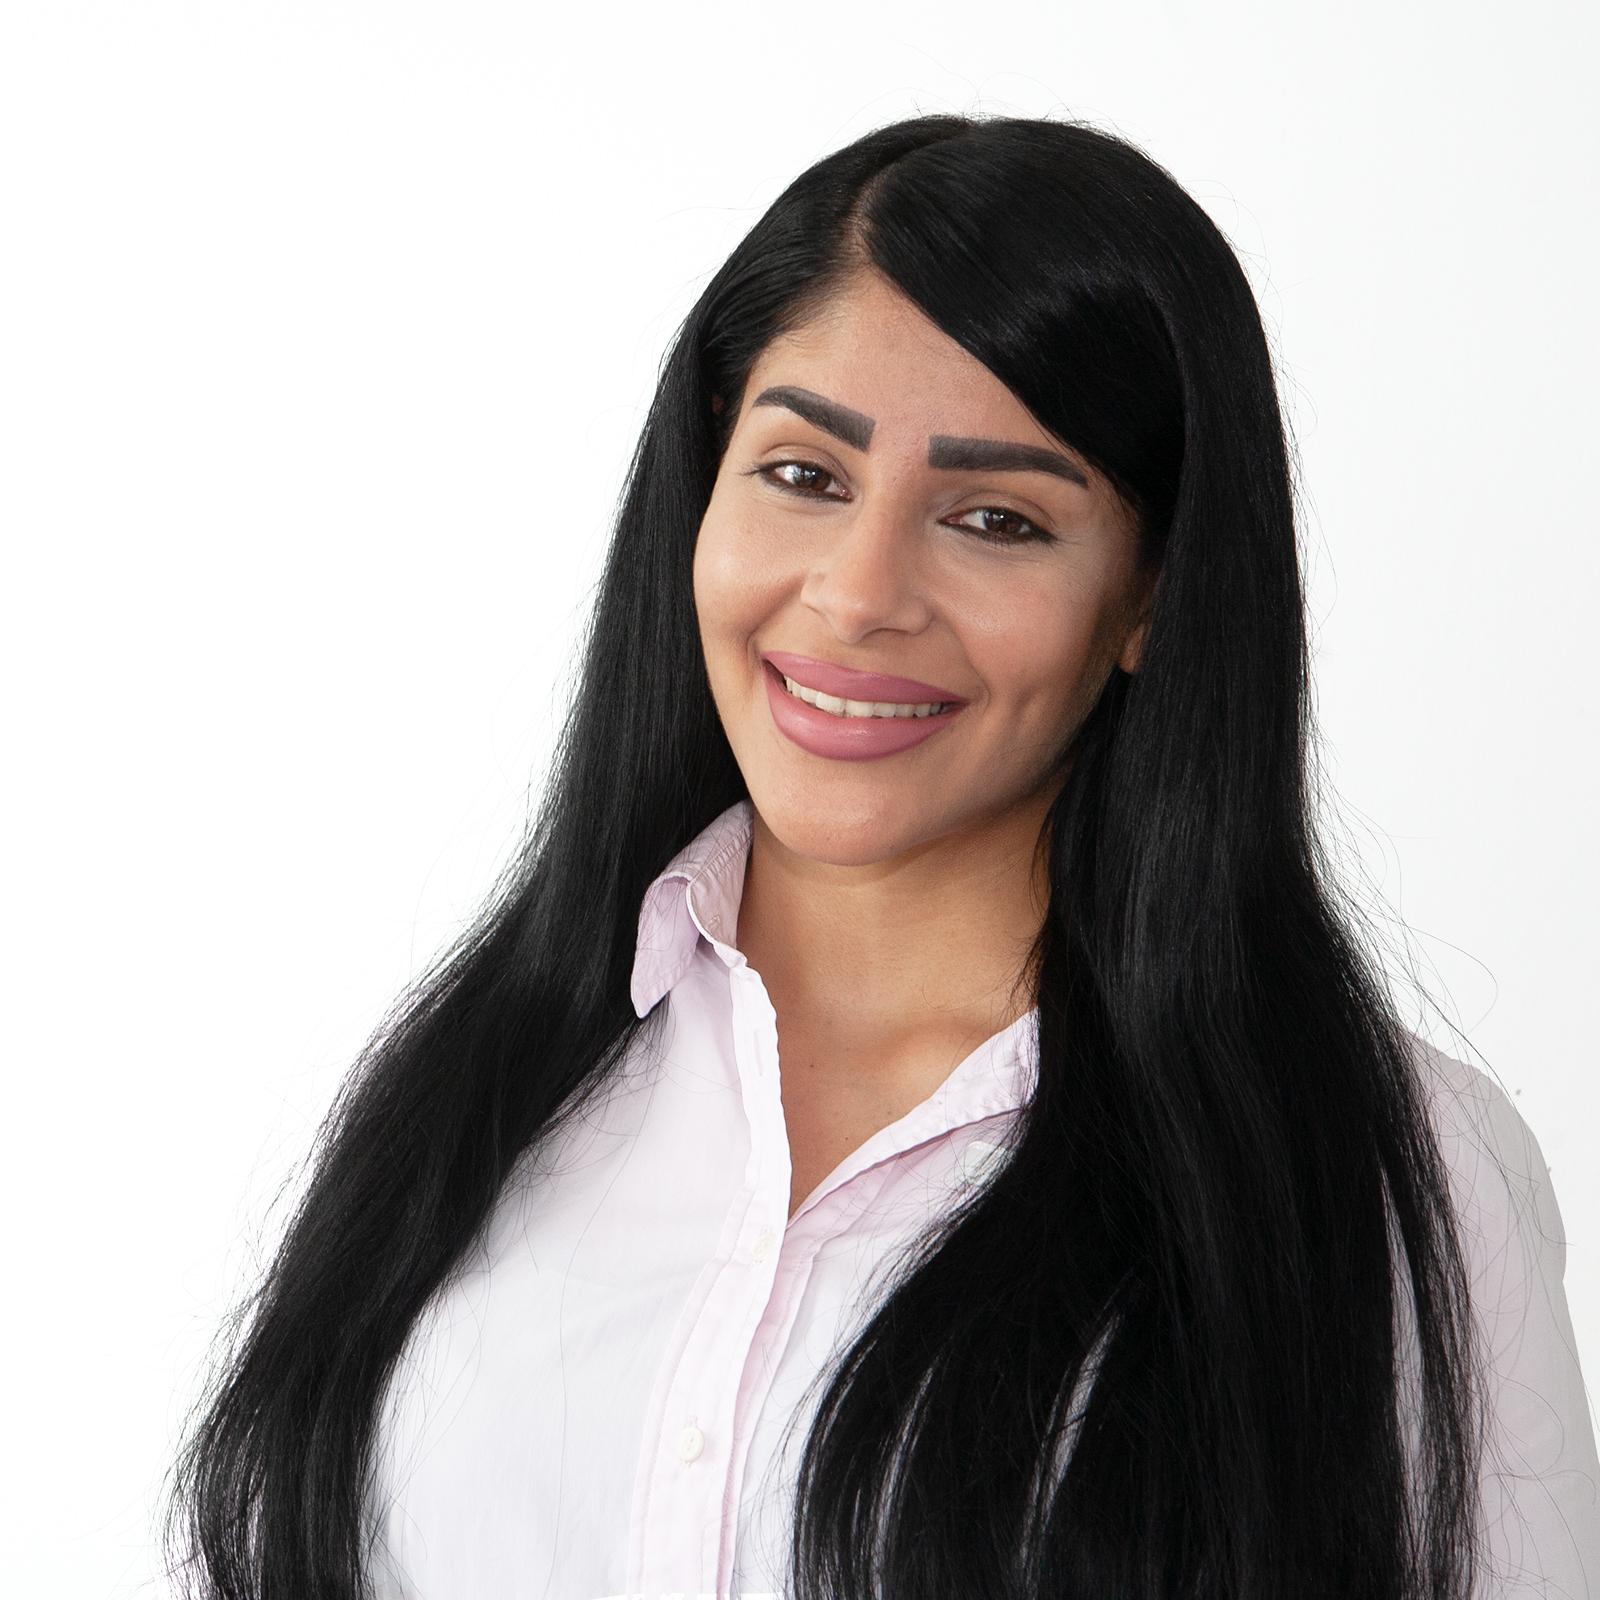 Sahar Pour Davood